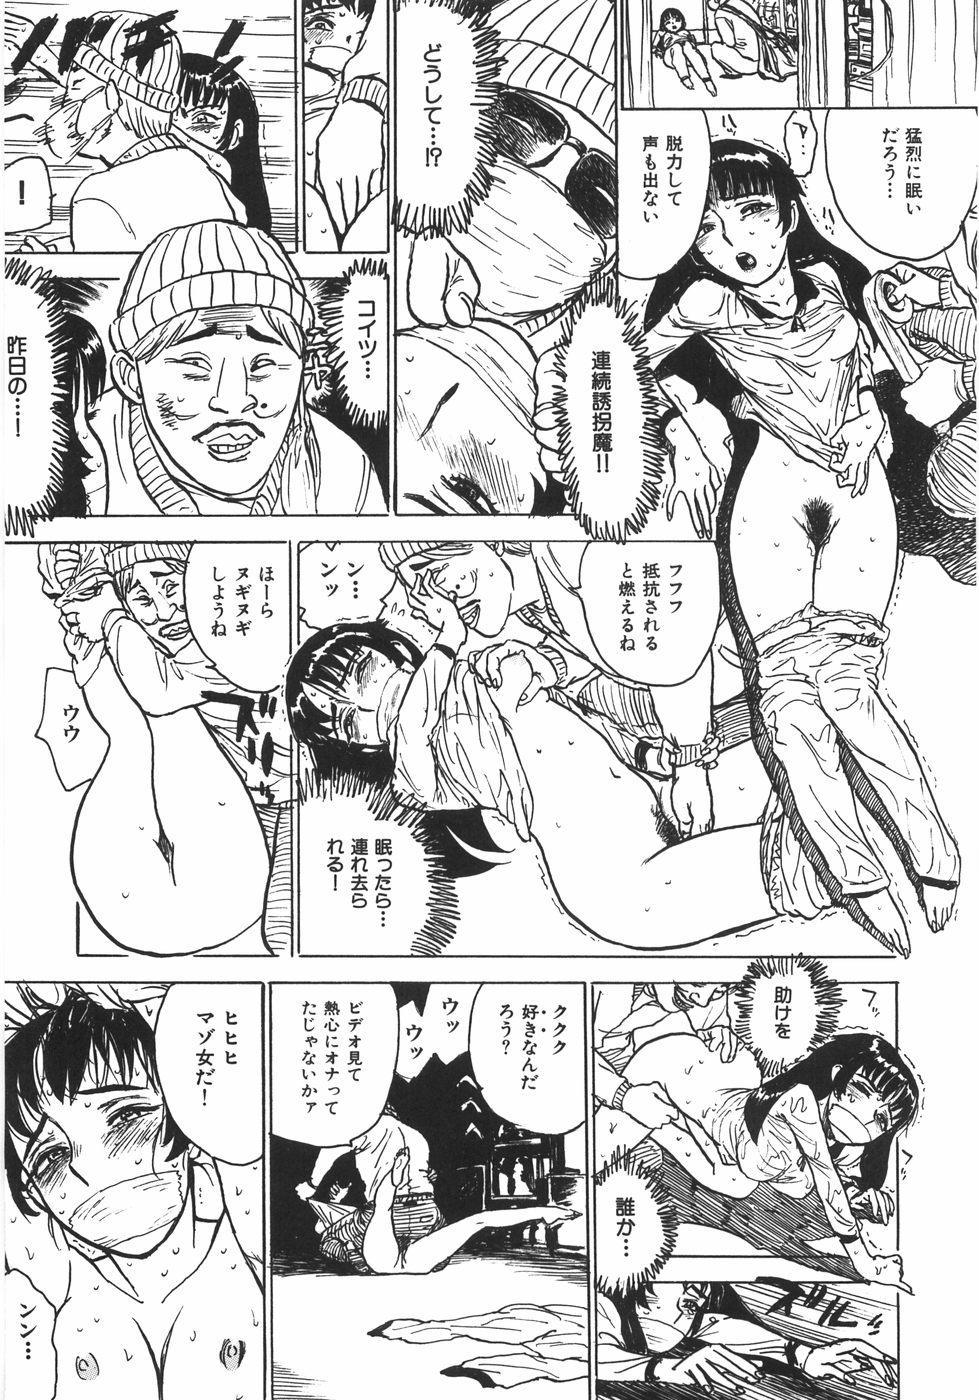 Ningyou no Yakata - The Doll House 163